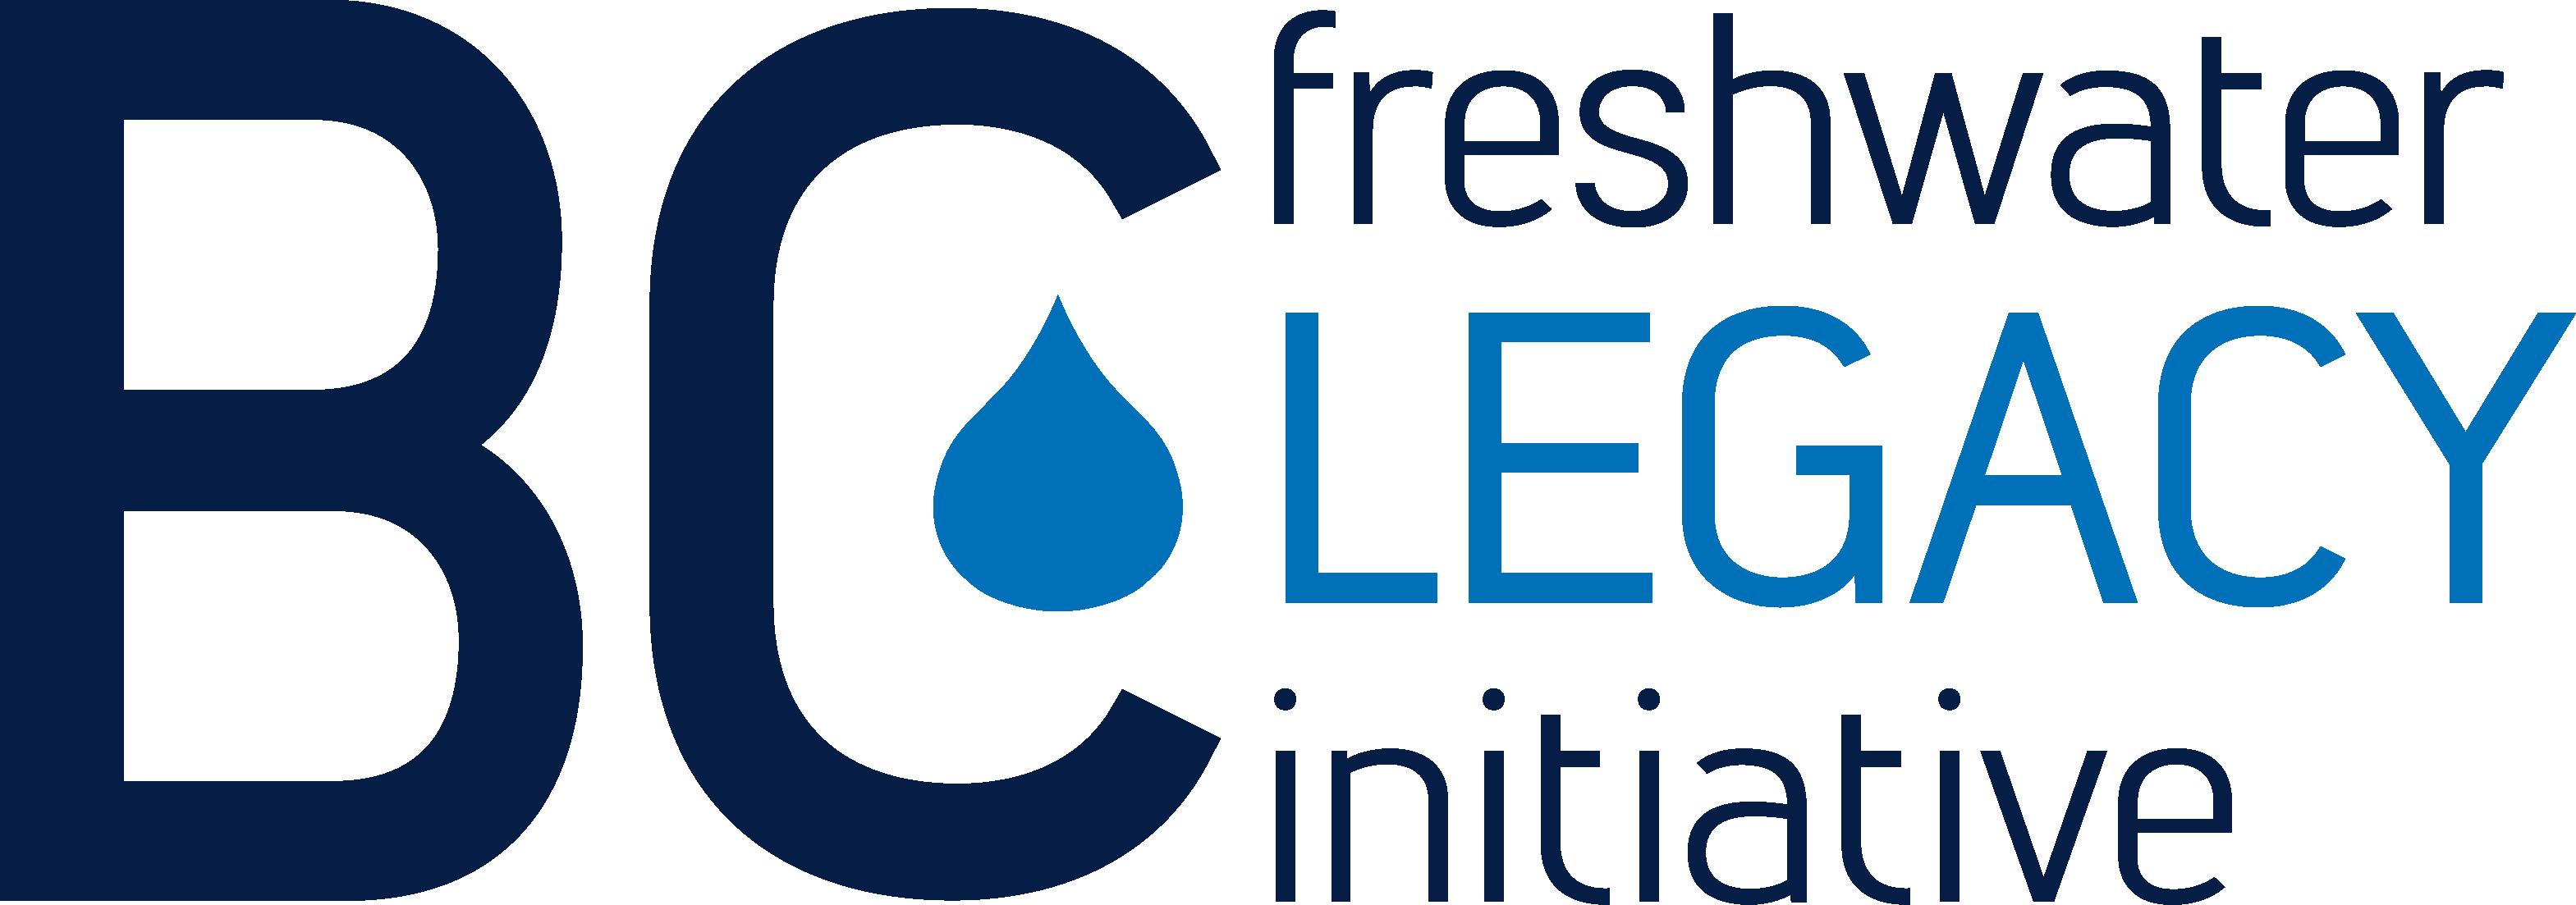 BCFLI logo (LARGER SIZE) oultines